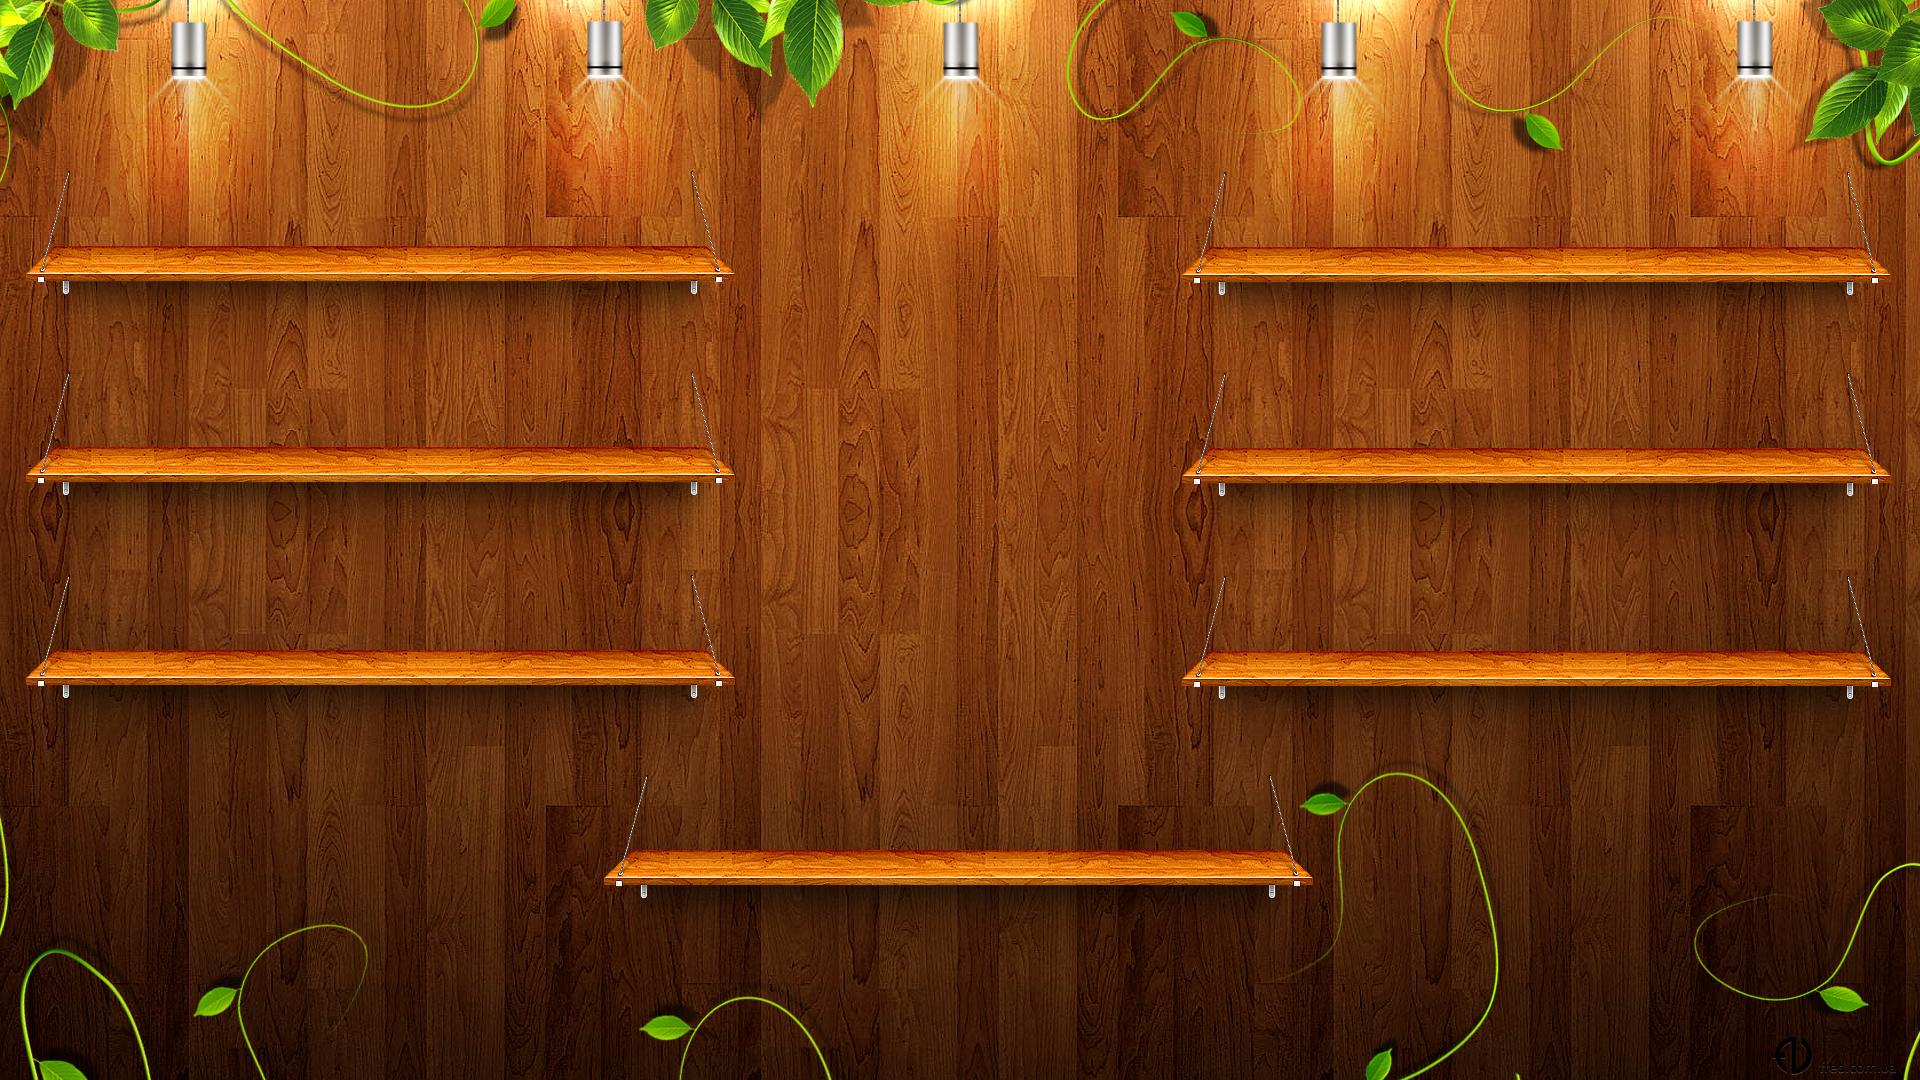 desktop wallpapers shelf with - photo #19